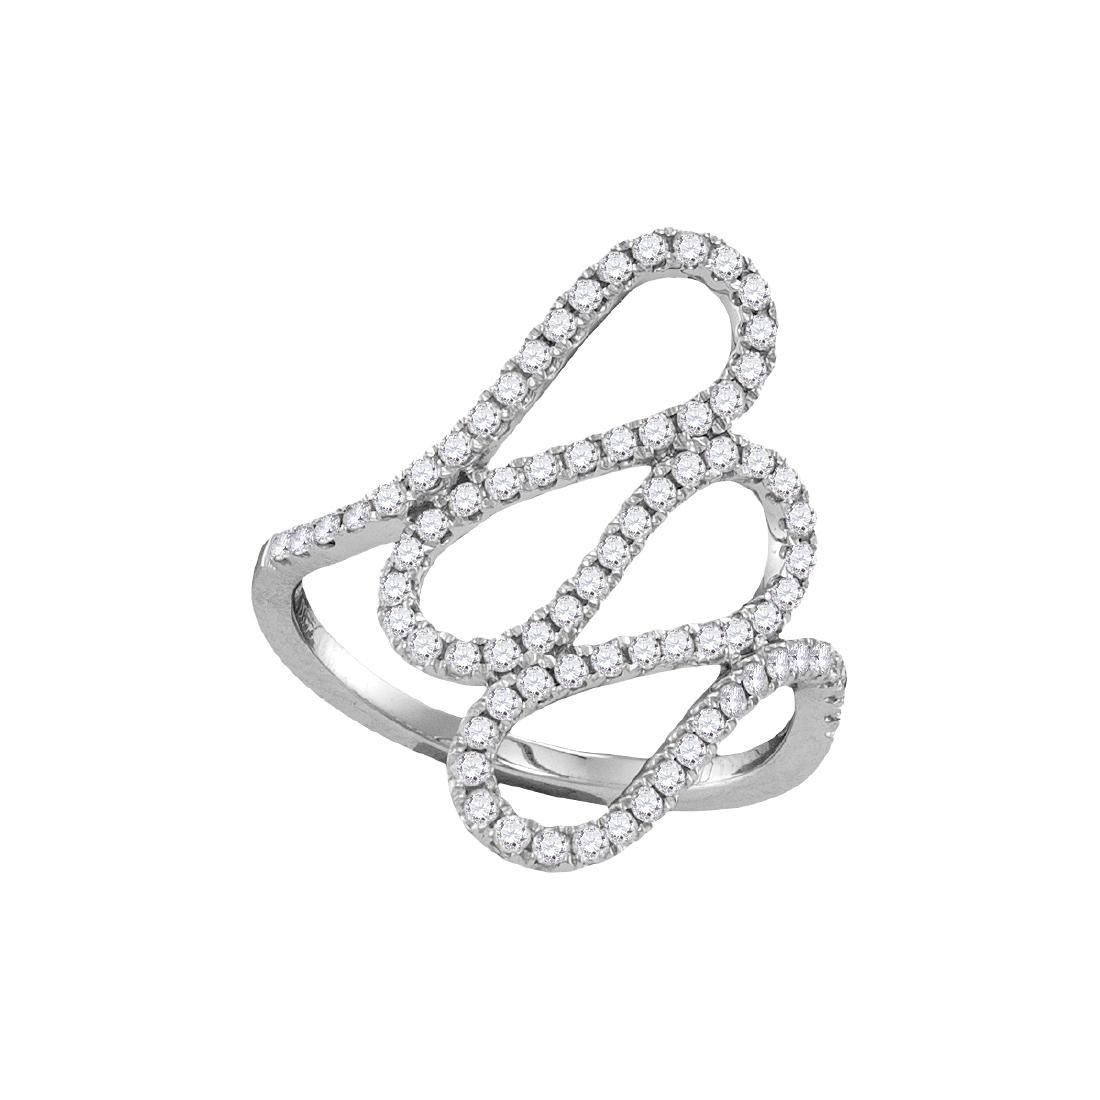 0.54 CTW Diamond Openwork Single Row Cascading Ring